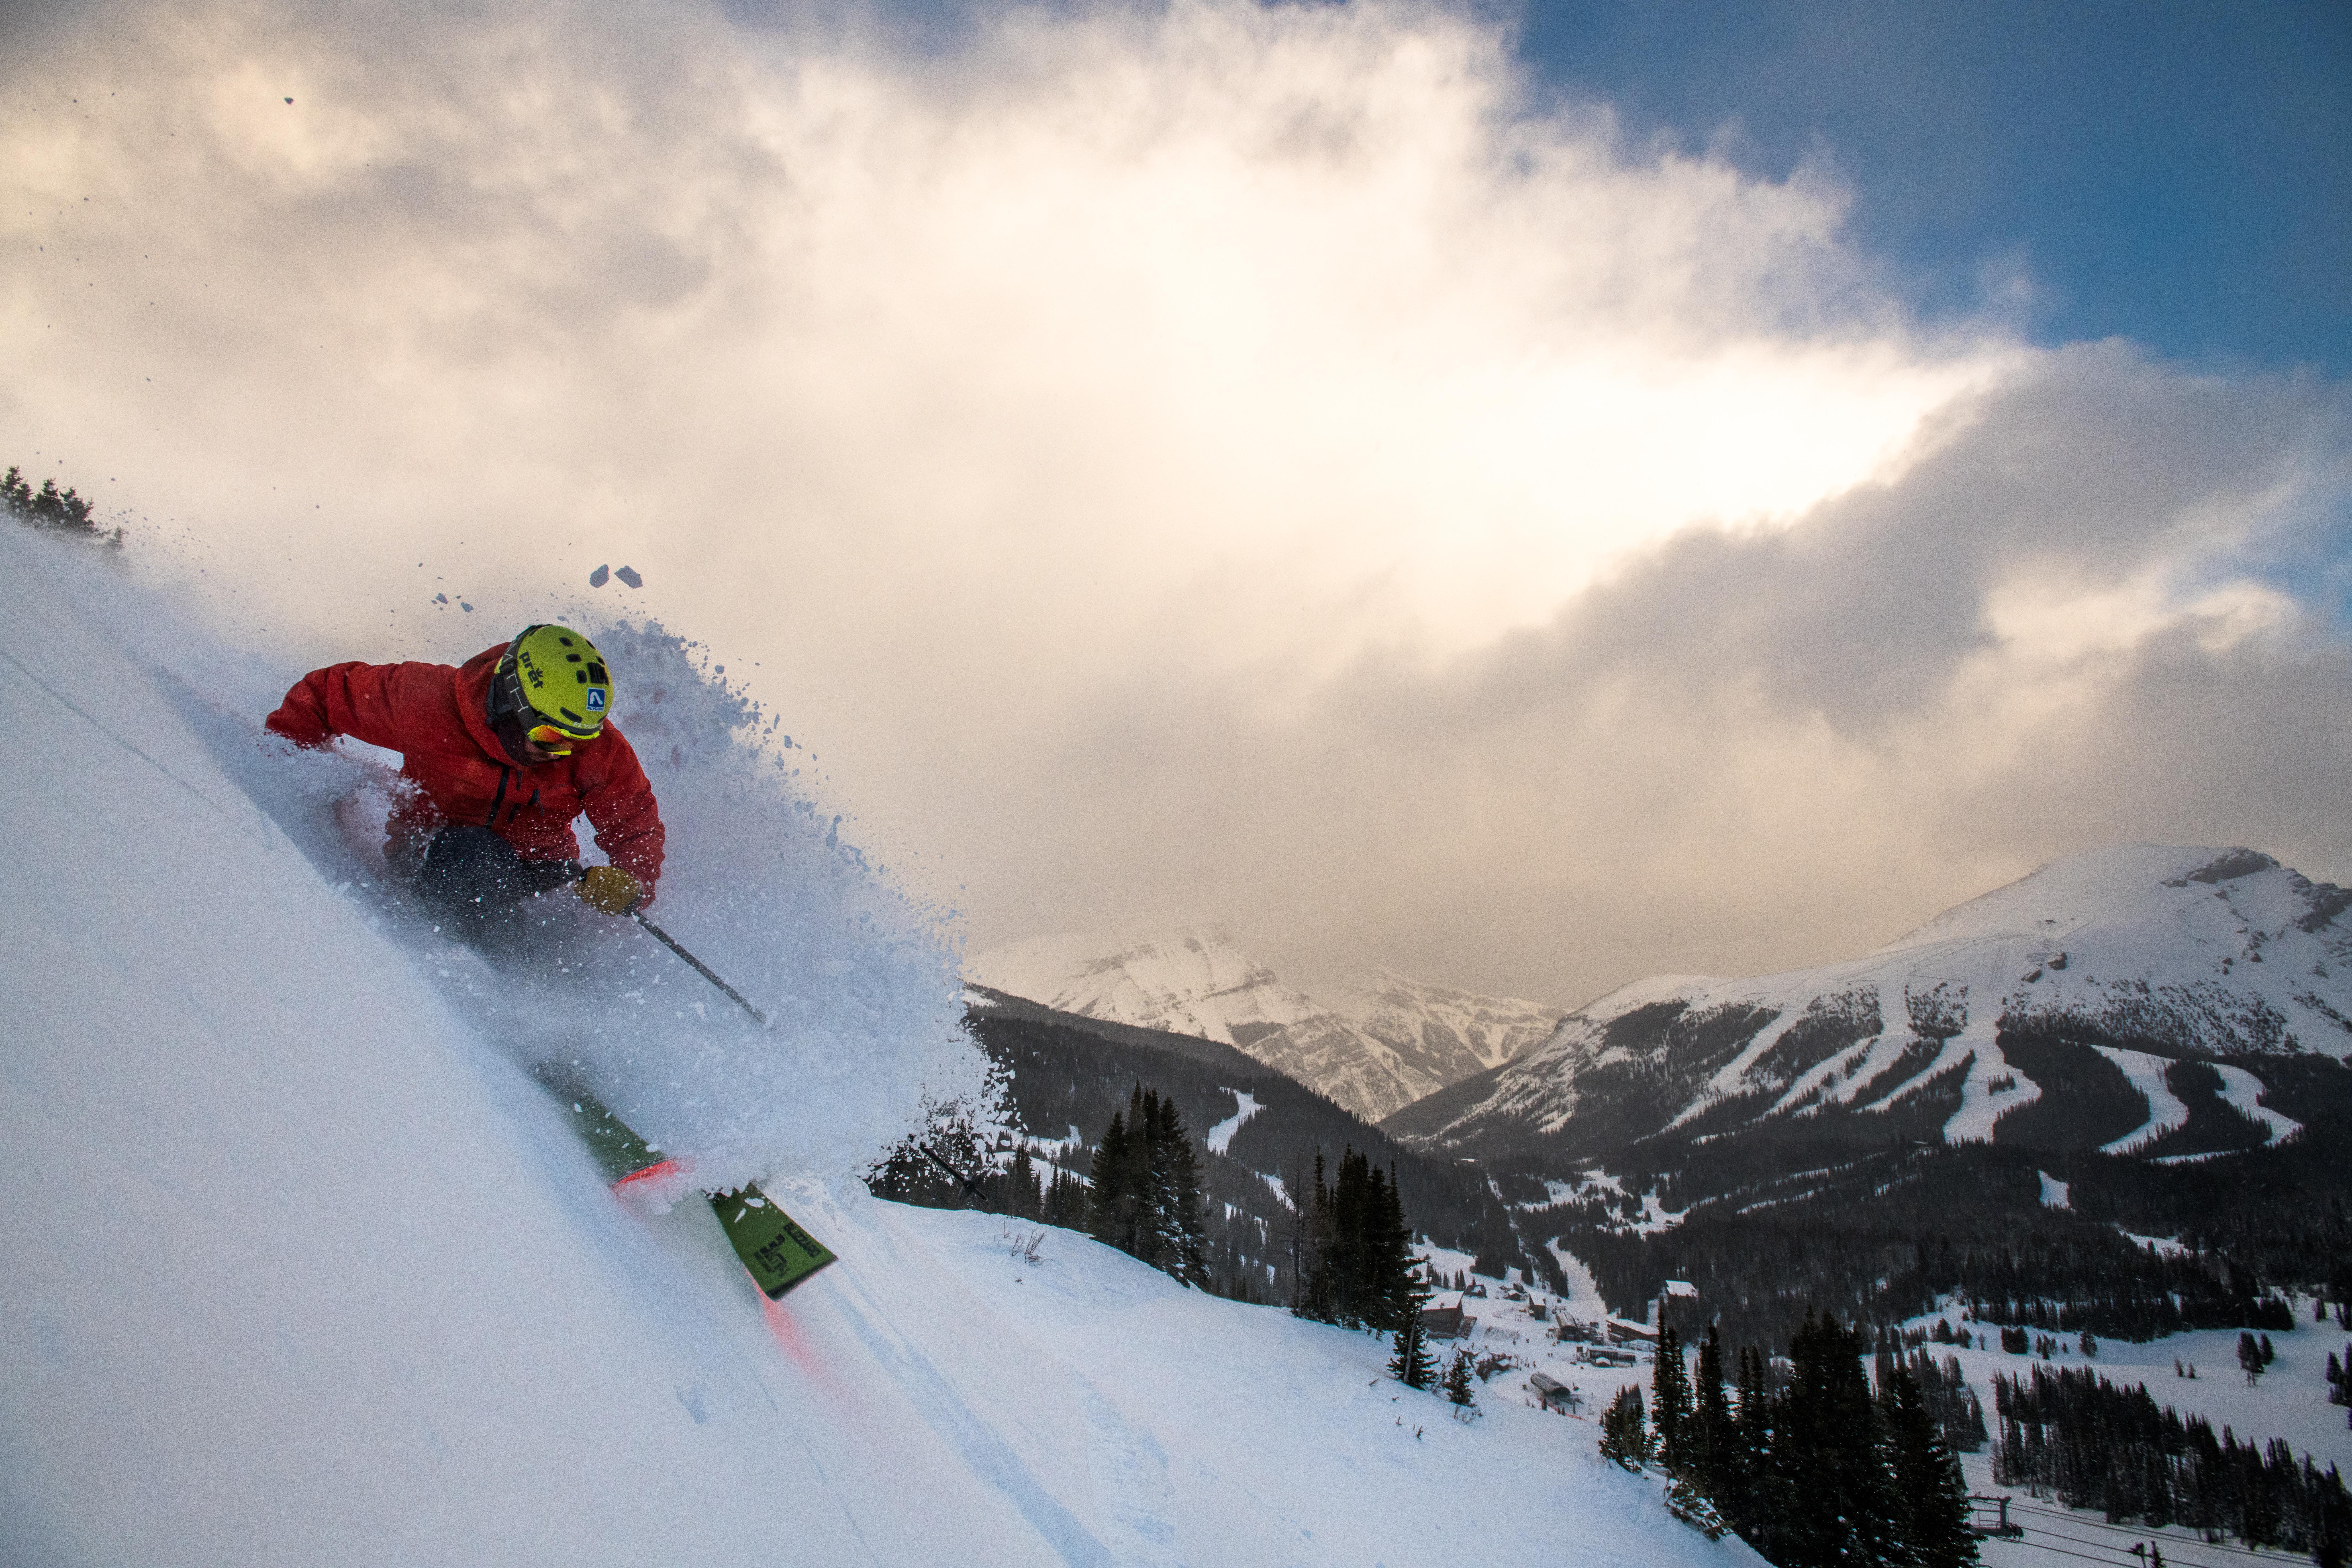 Banff resort. Picture by Reuben Krabbe